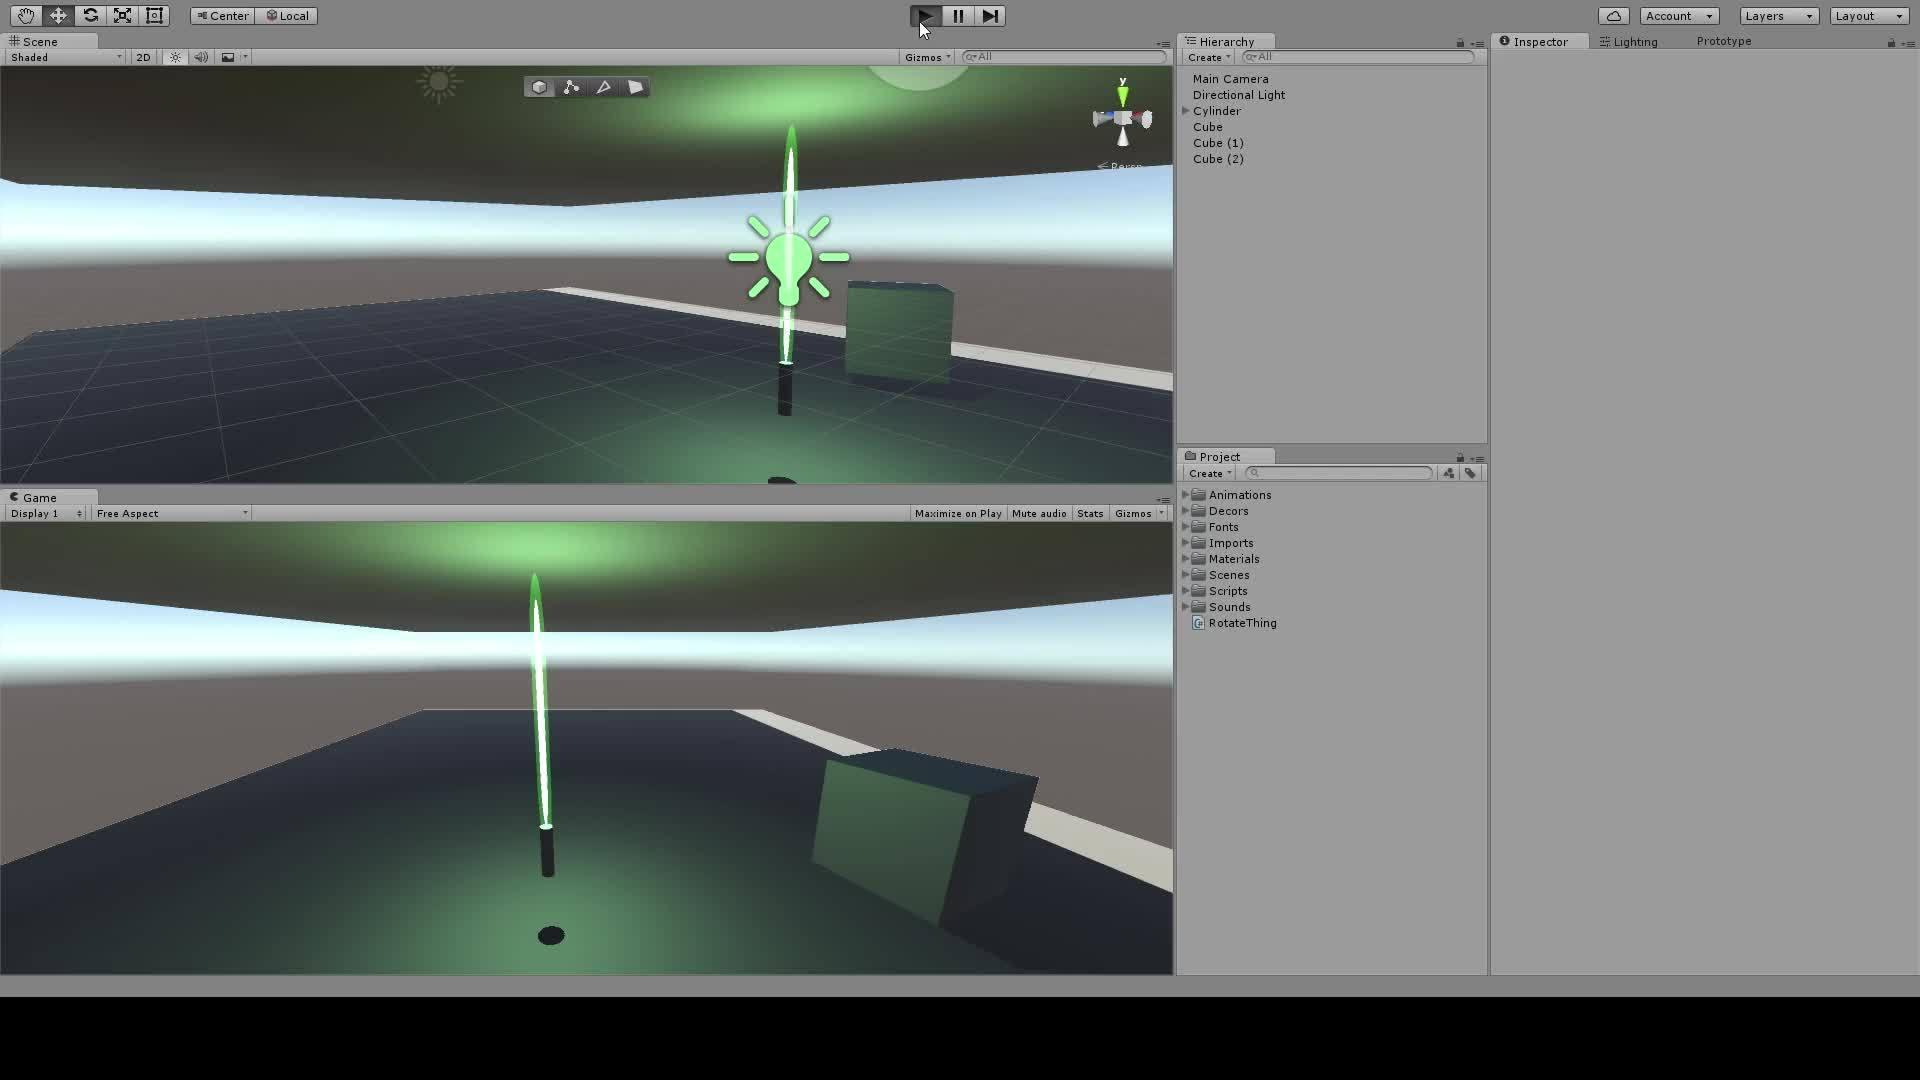 lighsaber, prototype, unity3d, Lightsaber in Unity3D GIFs